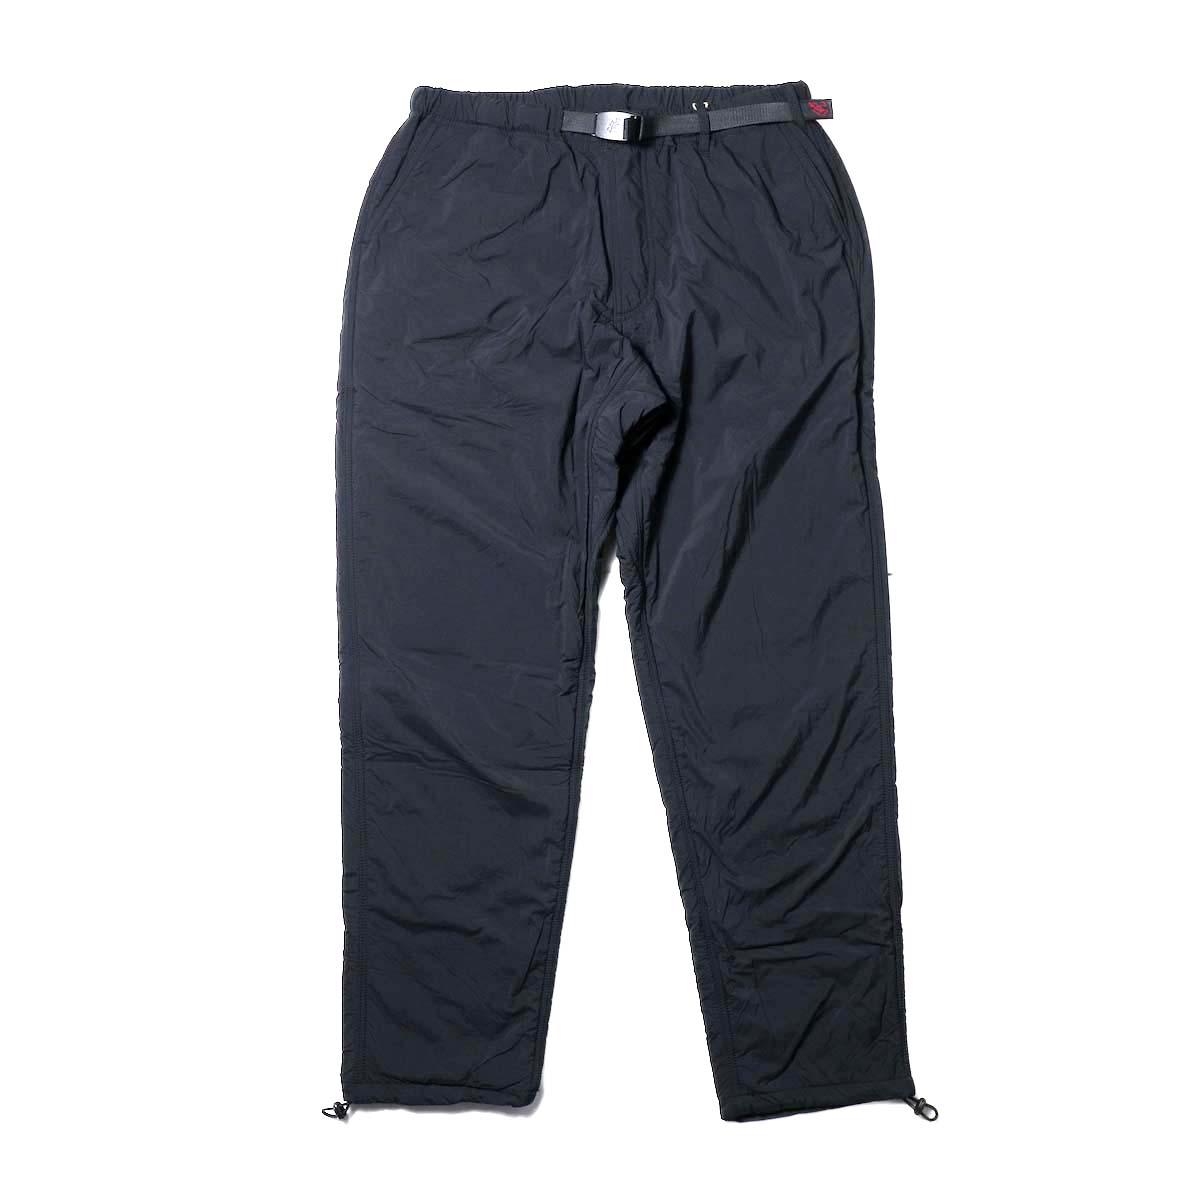 GRAMICCI / NYLON-FLEECE TRUCK PANTS (Black)